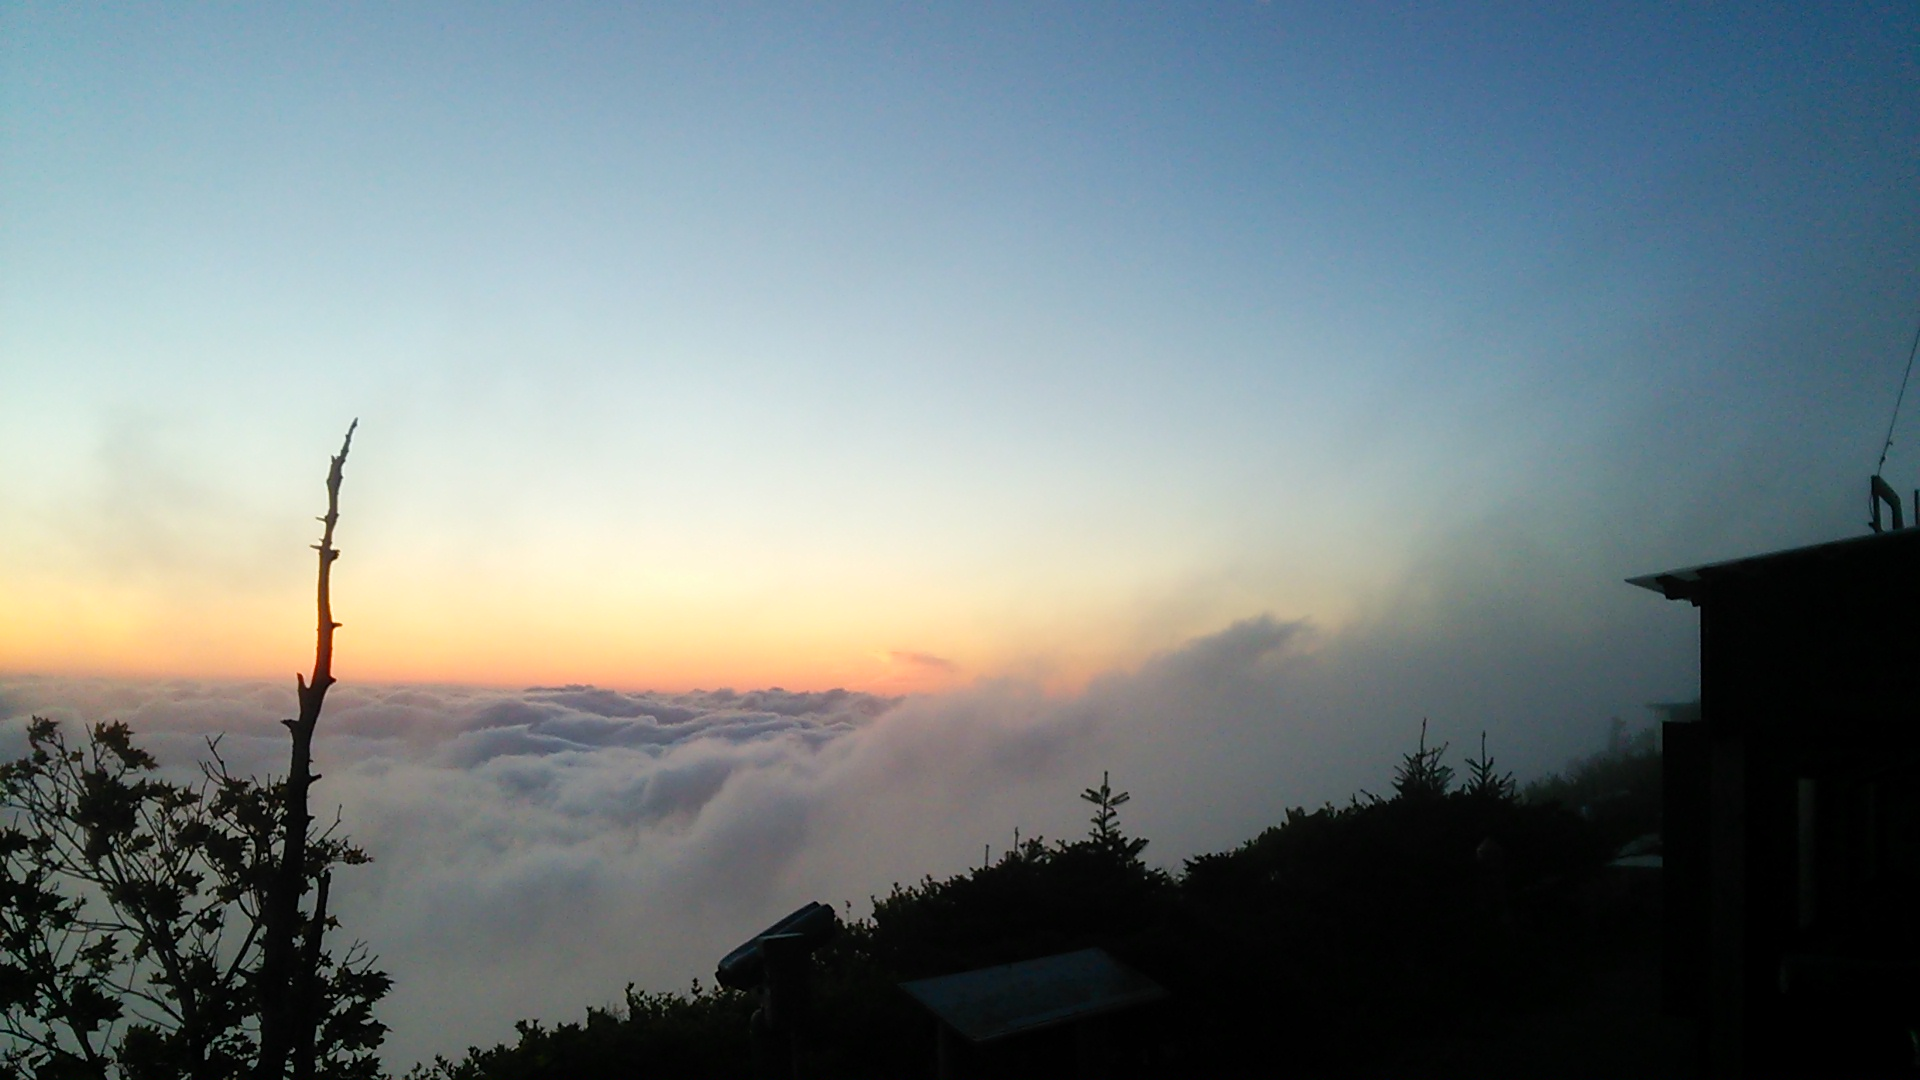 6月2日 朝の気温1℃。_c0089831_13501622.jpg